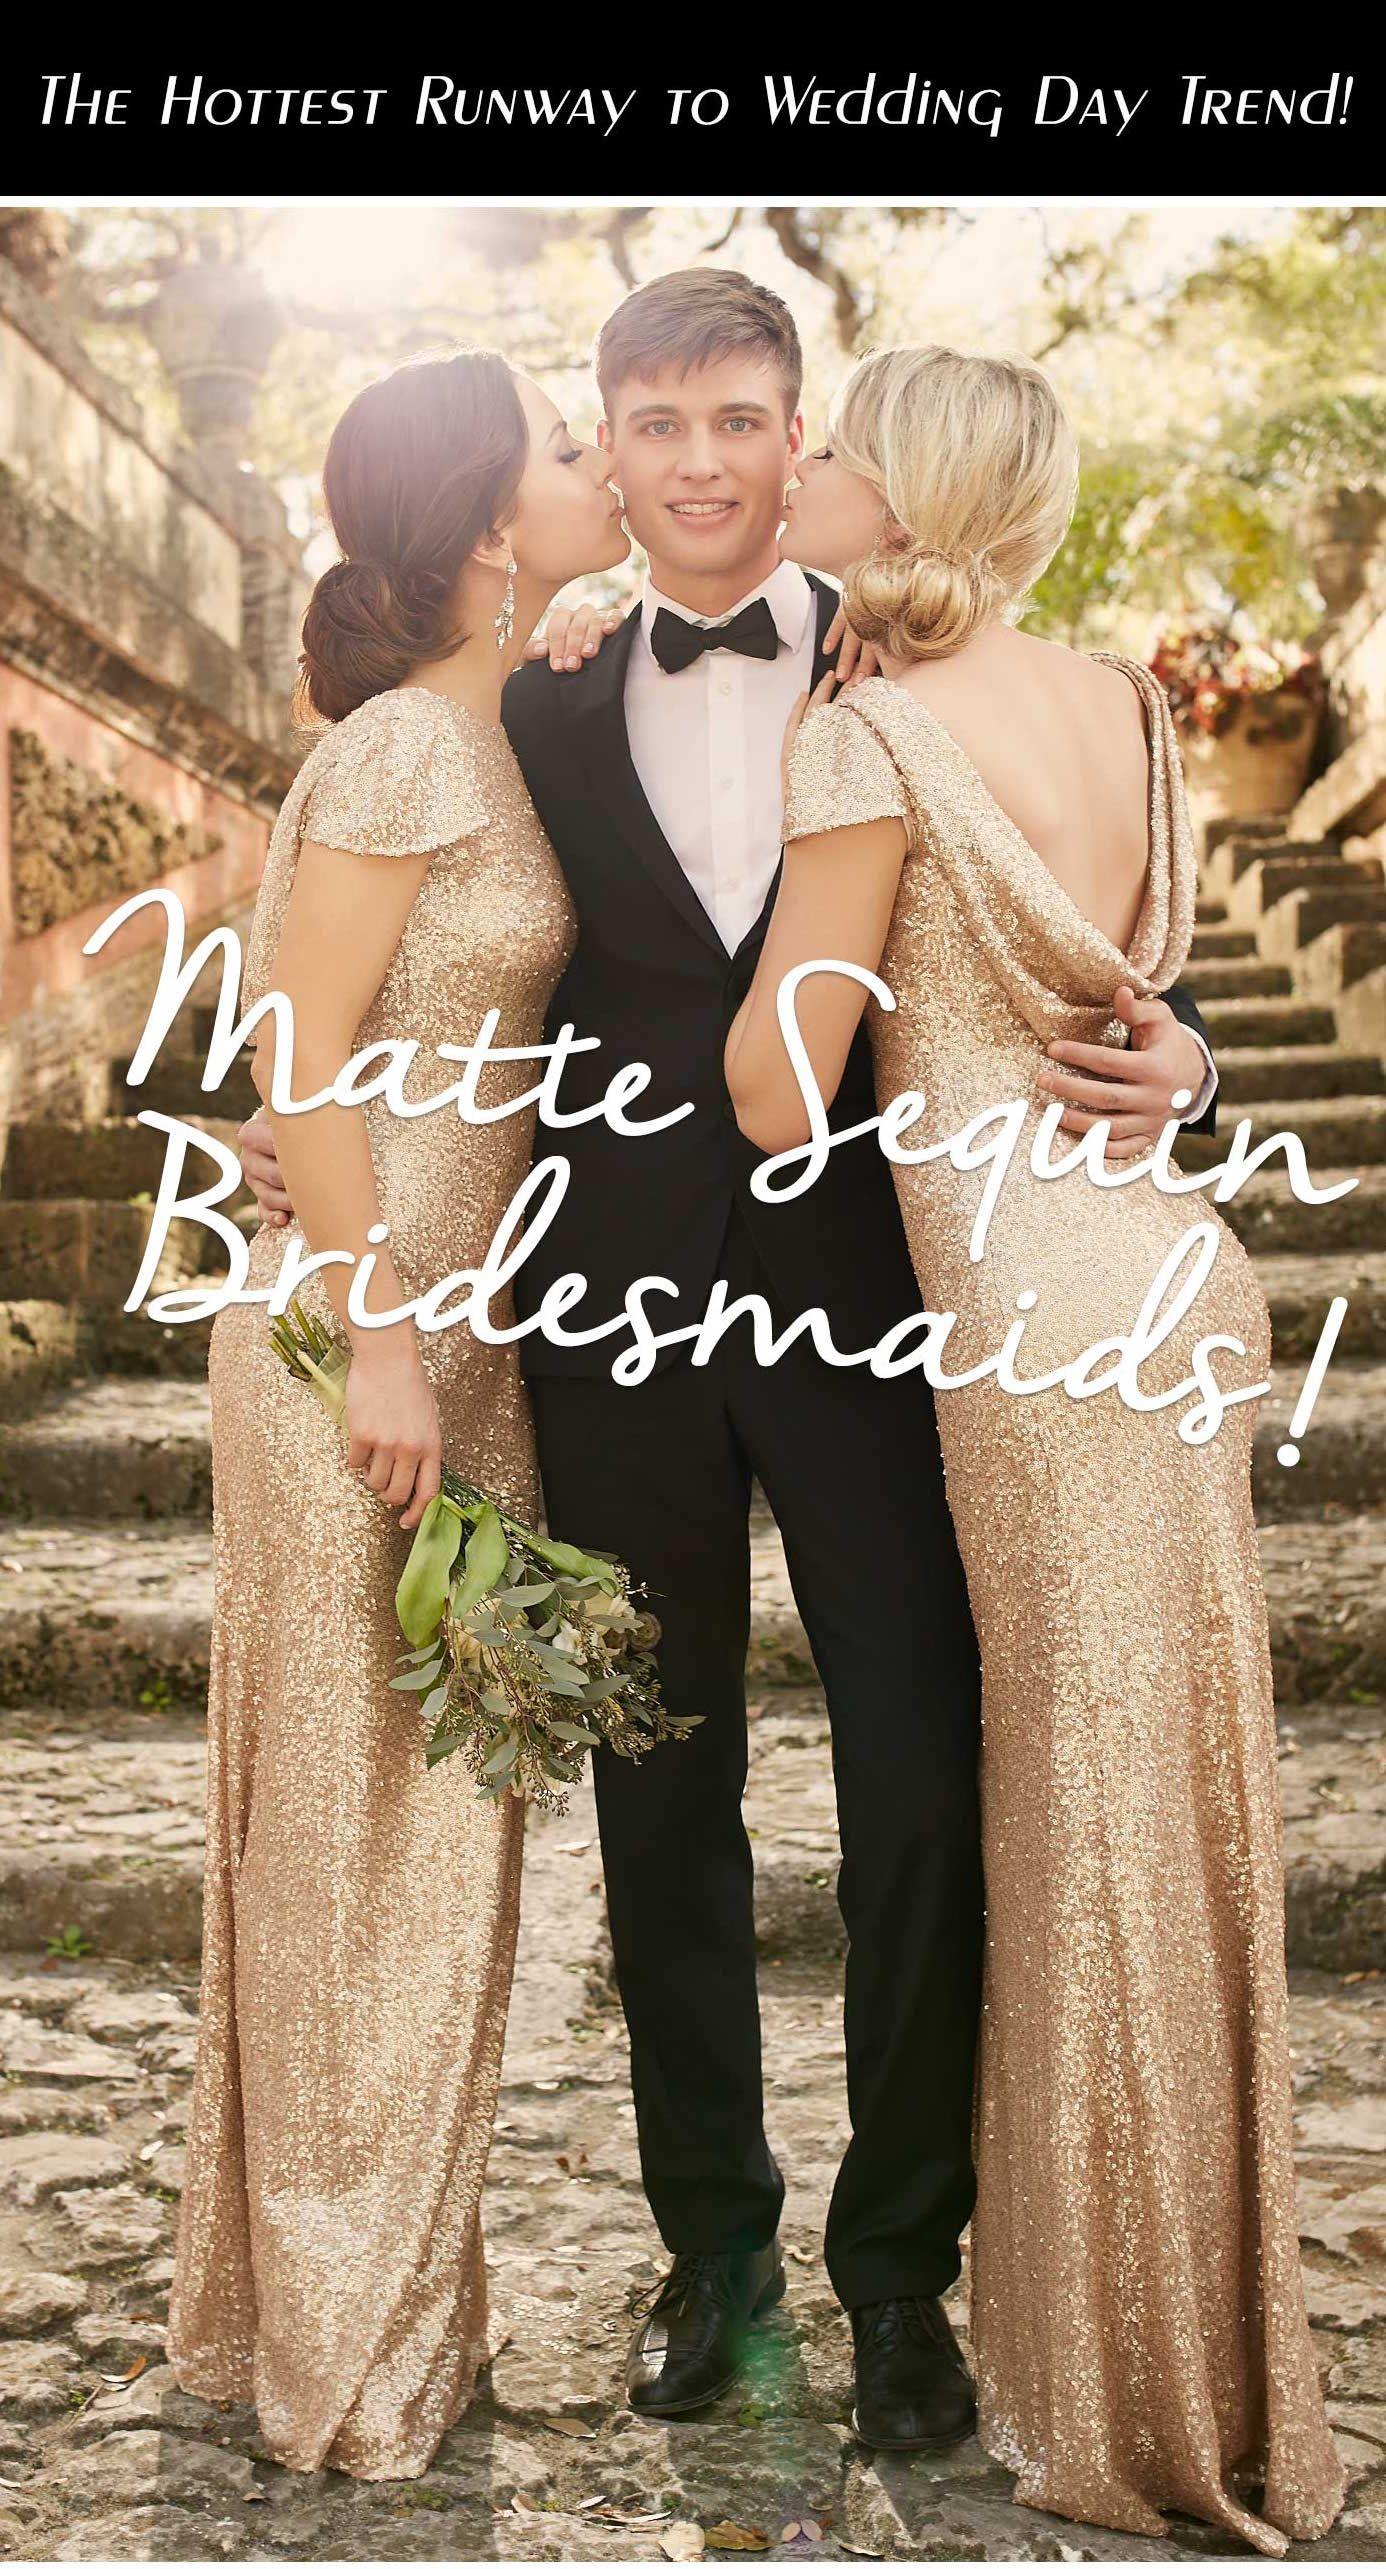 Matte Sequin Bridesmaids Trending Bridal Party Sparkly Cap Sleeve Bridesmaid